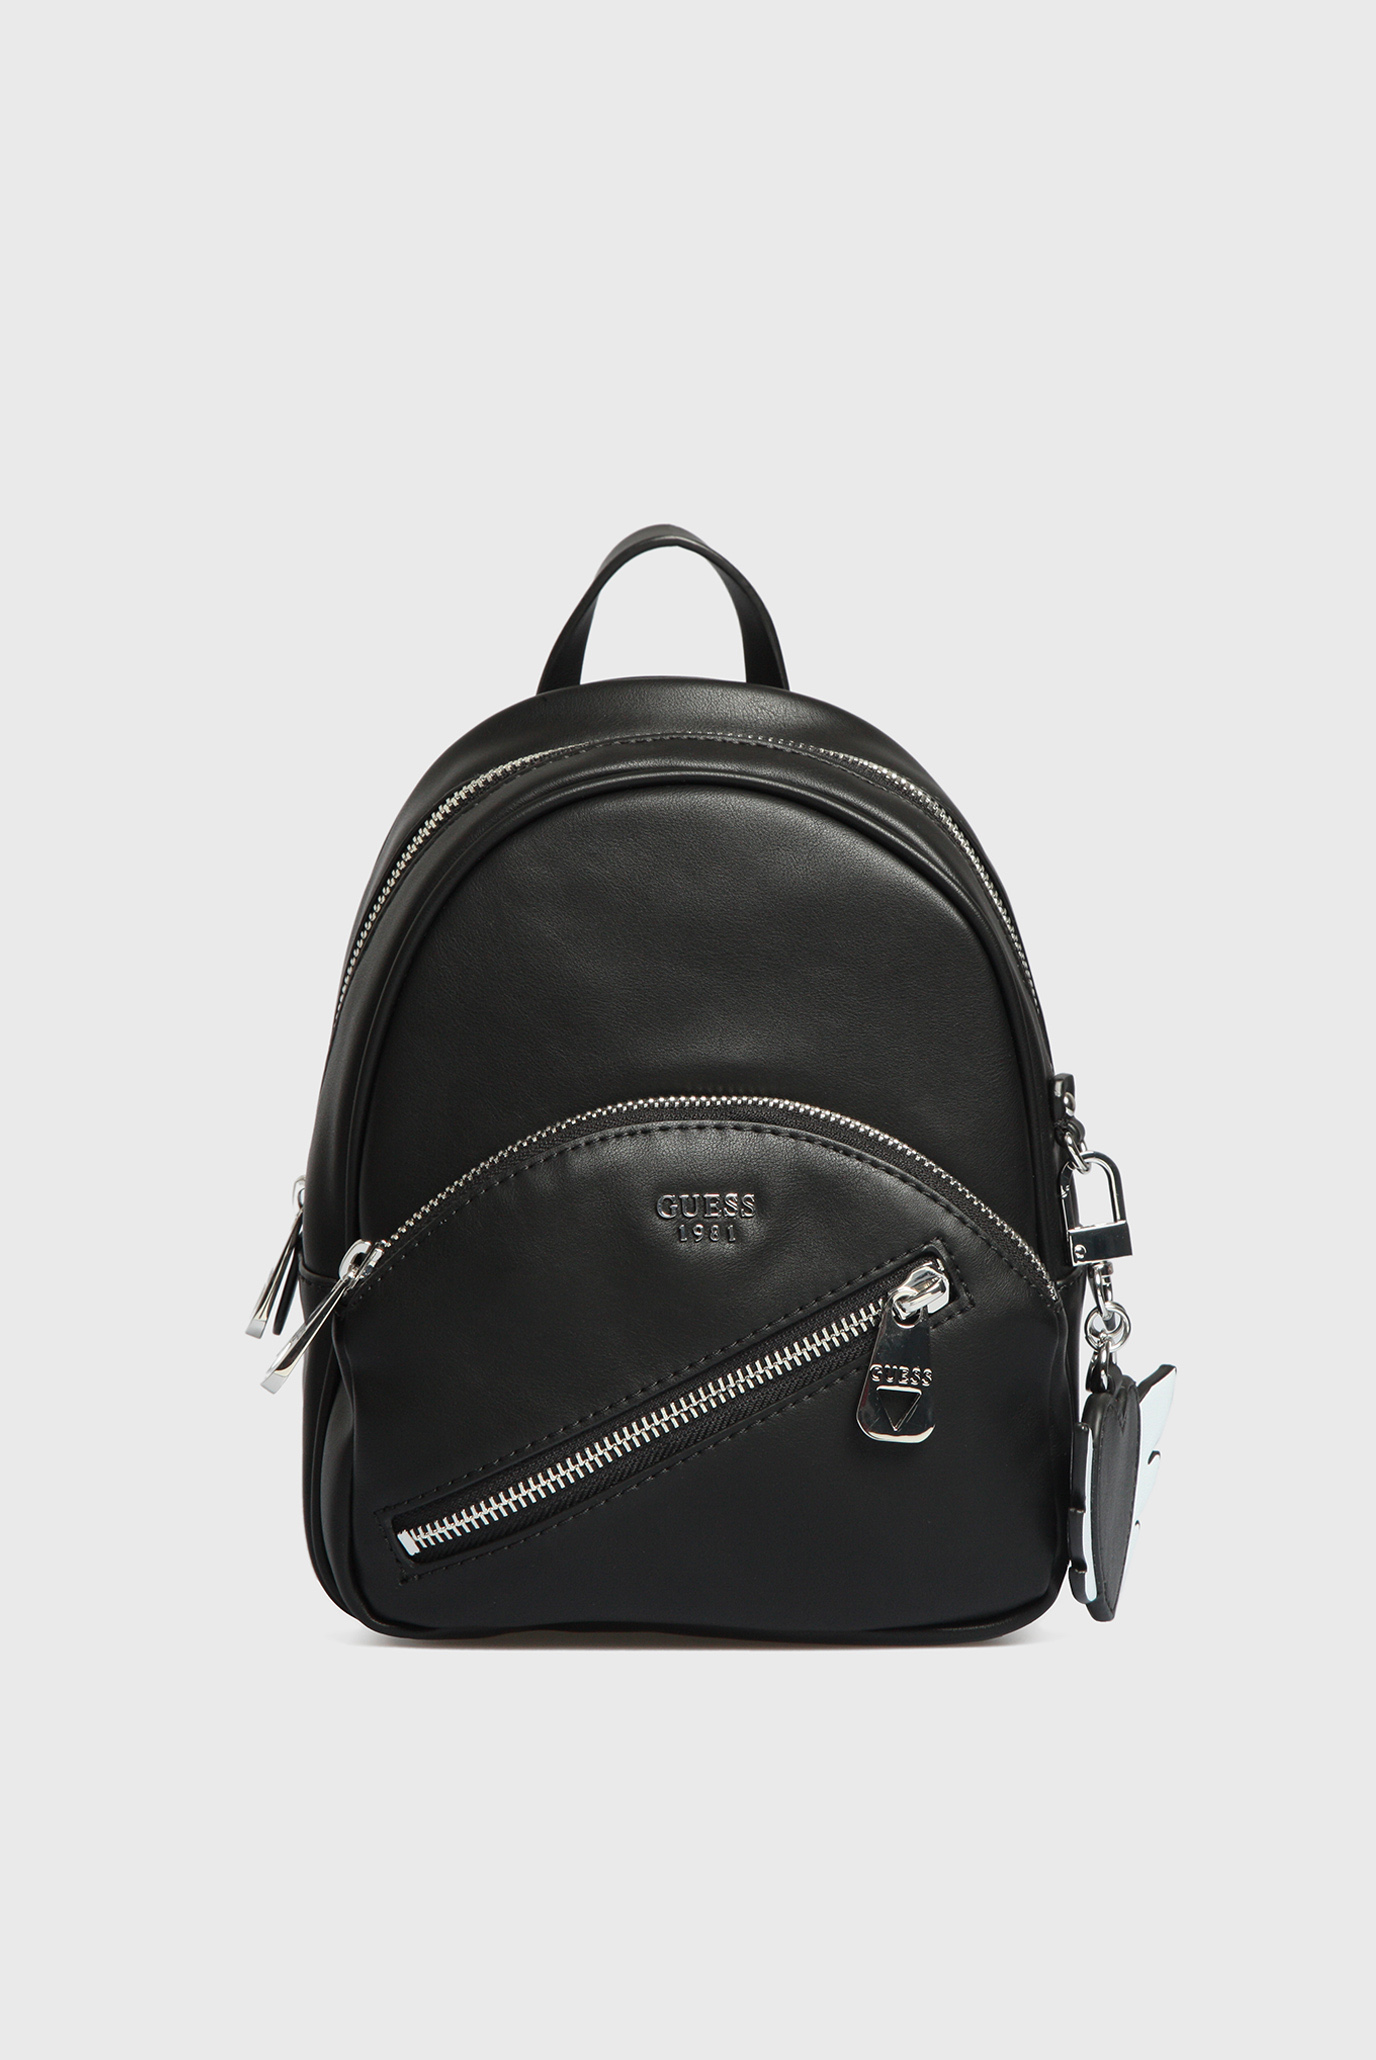 Купить Женский черный рюкзак Guess Guess HWVY6689310 – Киев e6f5303eb1e10